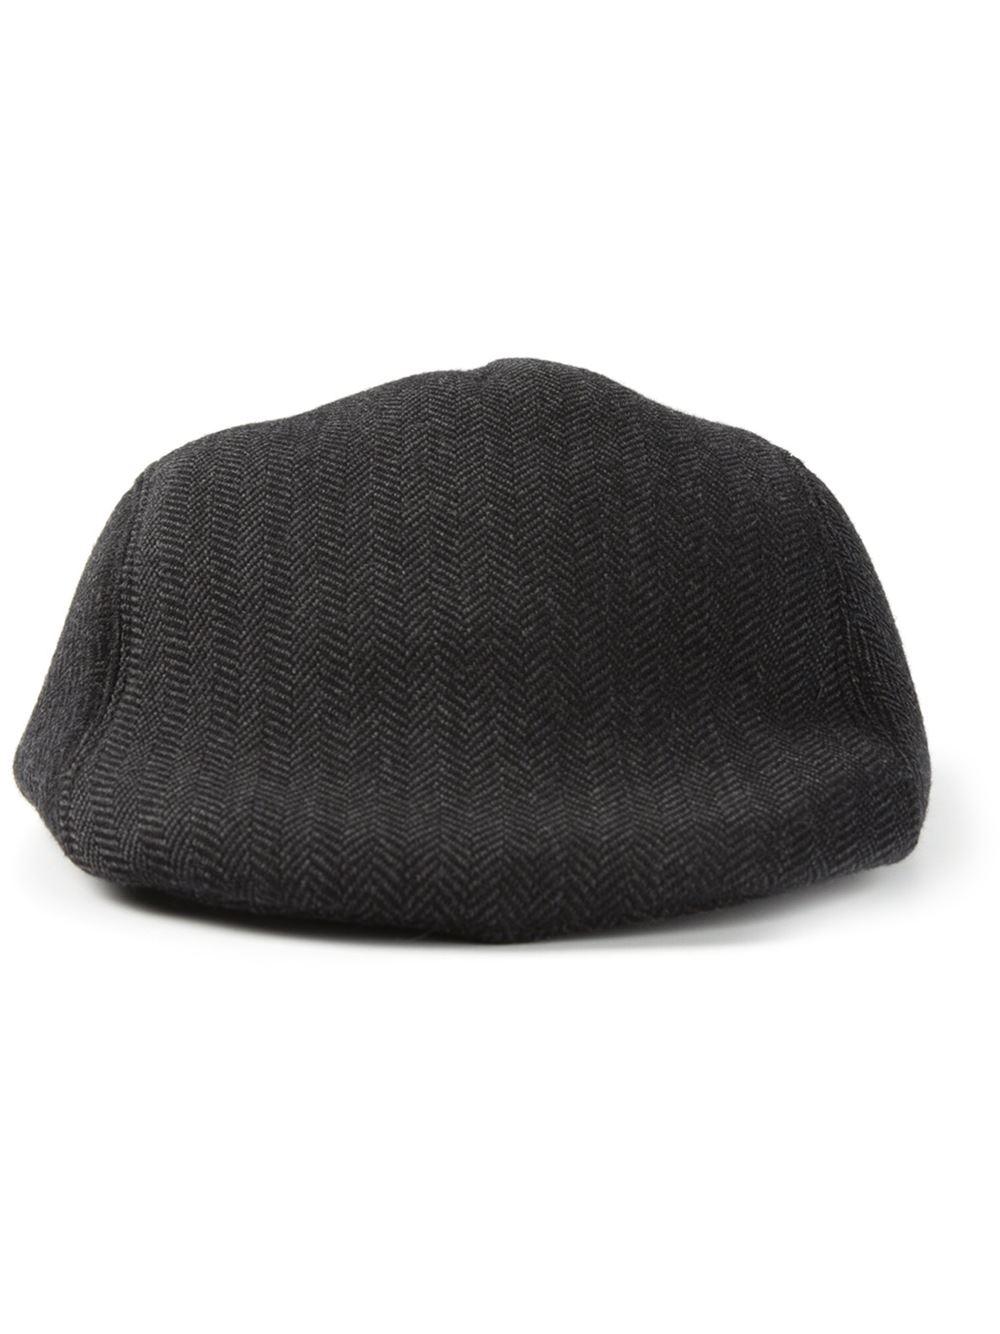 fee00c12f Paul Smith Flat Cap in Gray for Men - Lyst